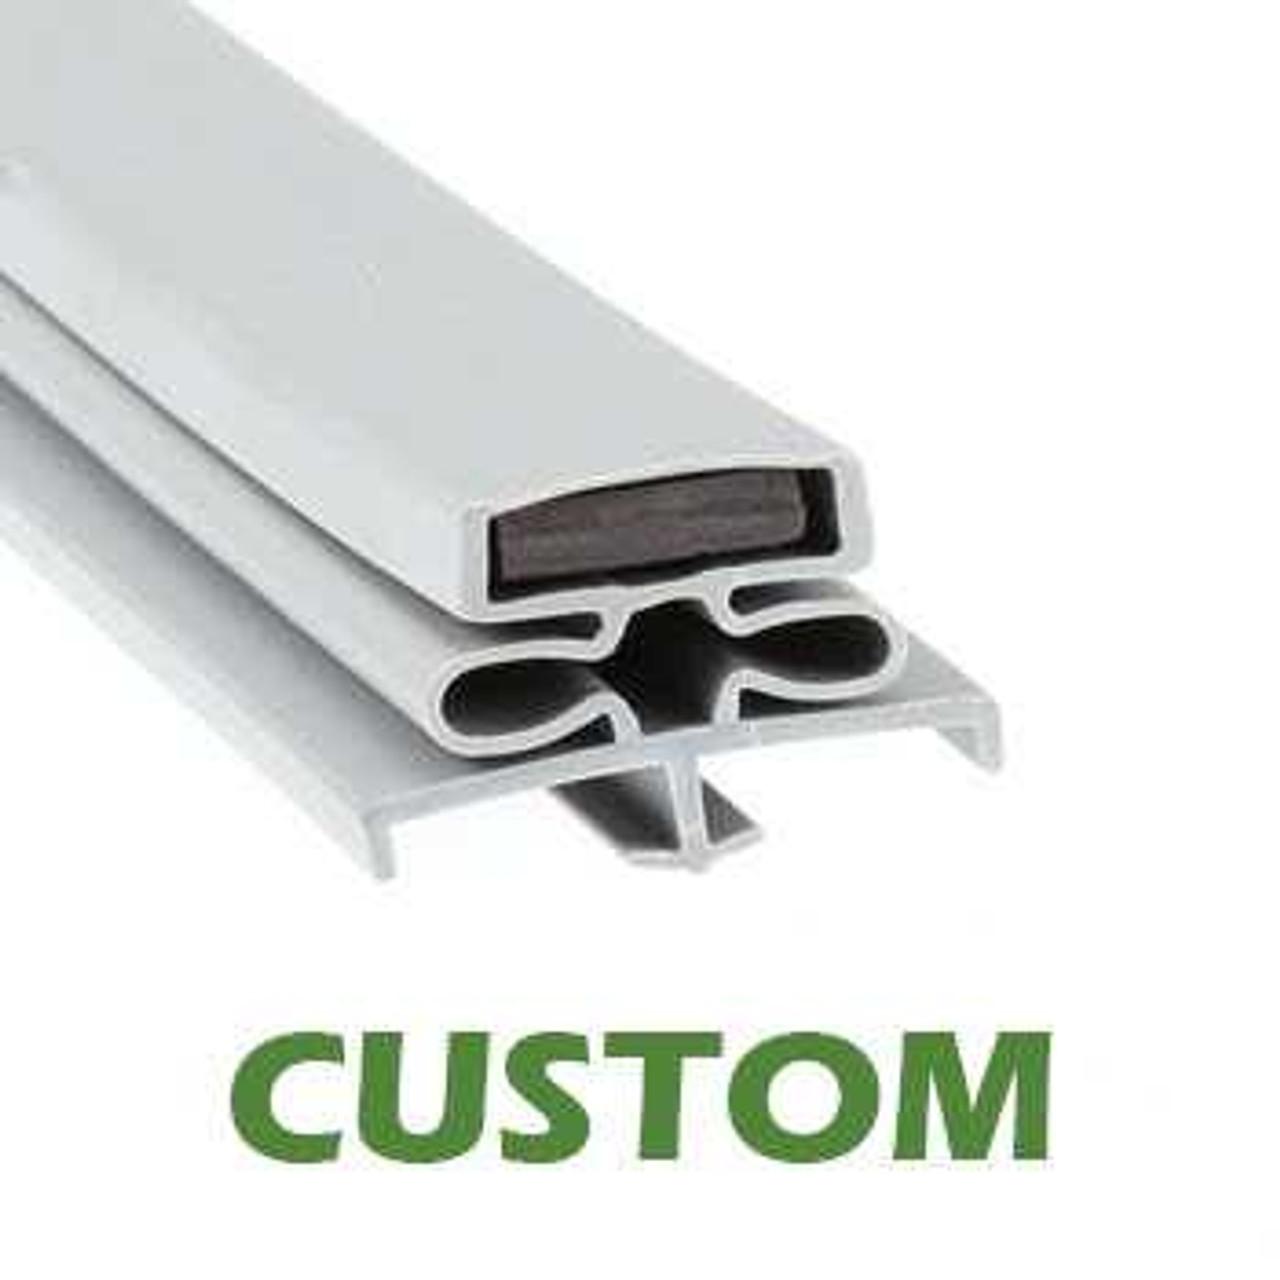 Profile 166 - Custom Refrigeration Gasket Custom Gaskets 0